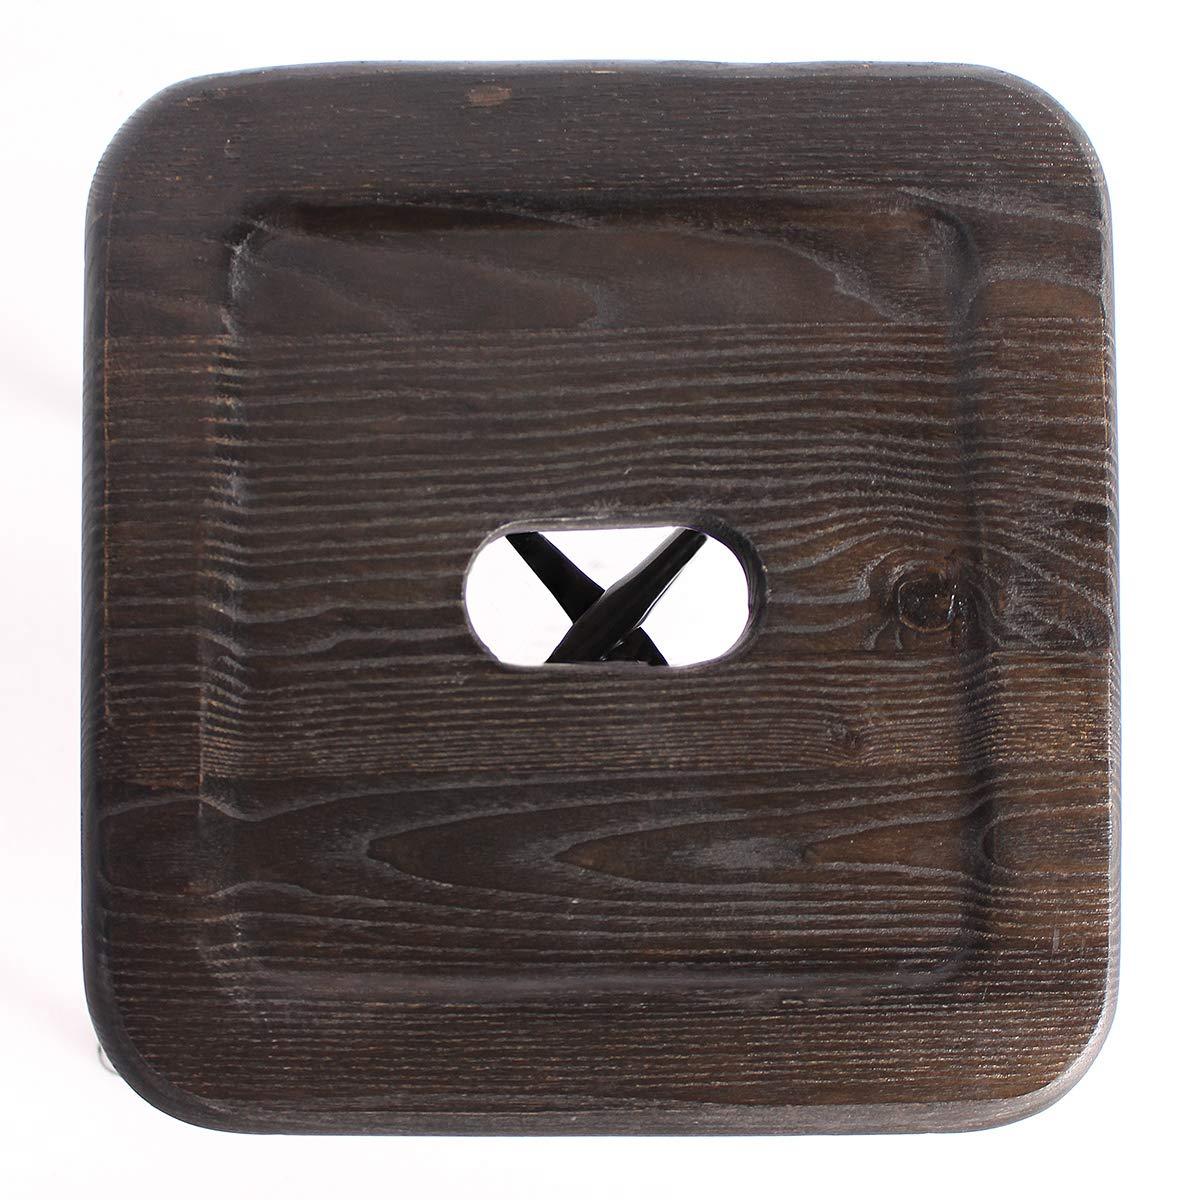 Buschman Metal Bar Stools 24'' Counter Height, Indoor/Outdoor and Stackable, Set of 4 (Regular Grey with Premium Wooden Seat) by Buschman Store